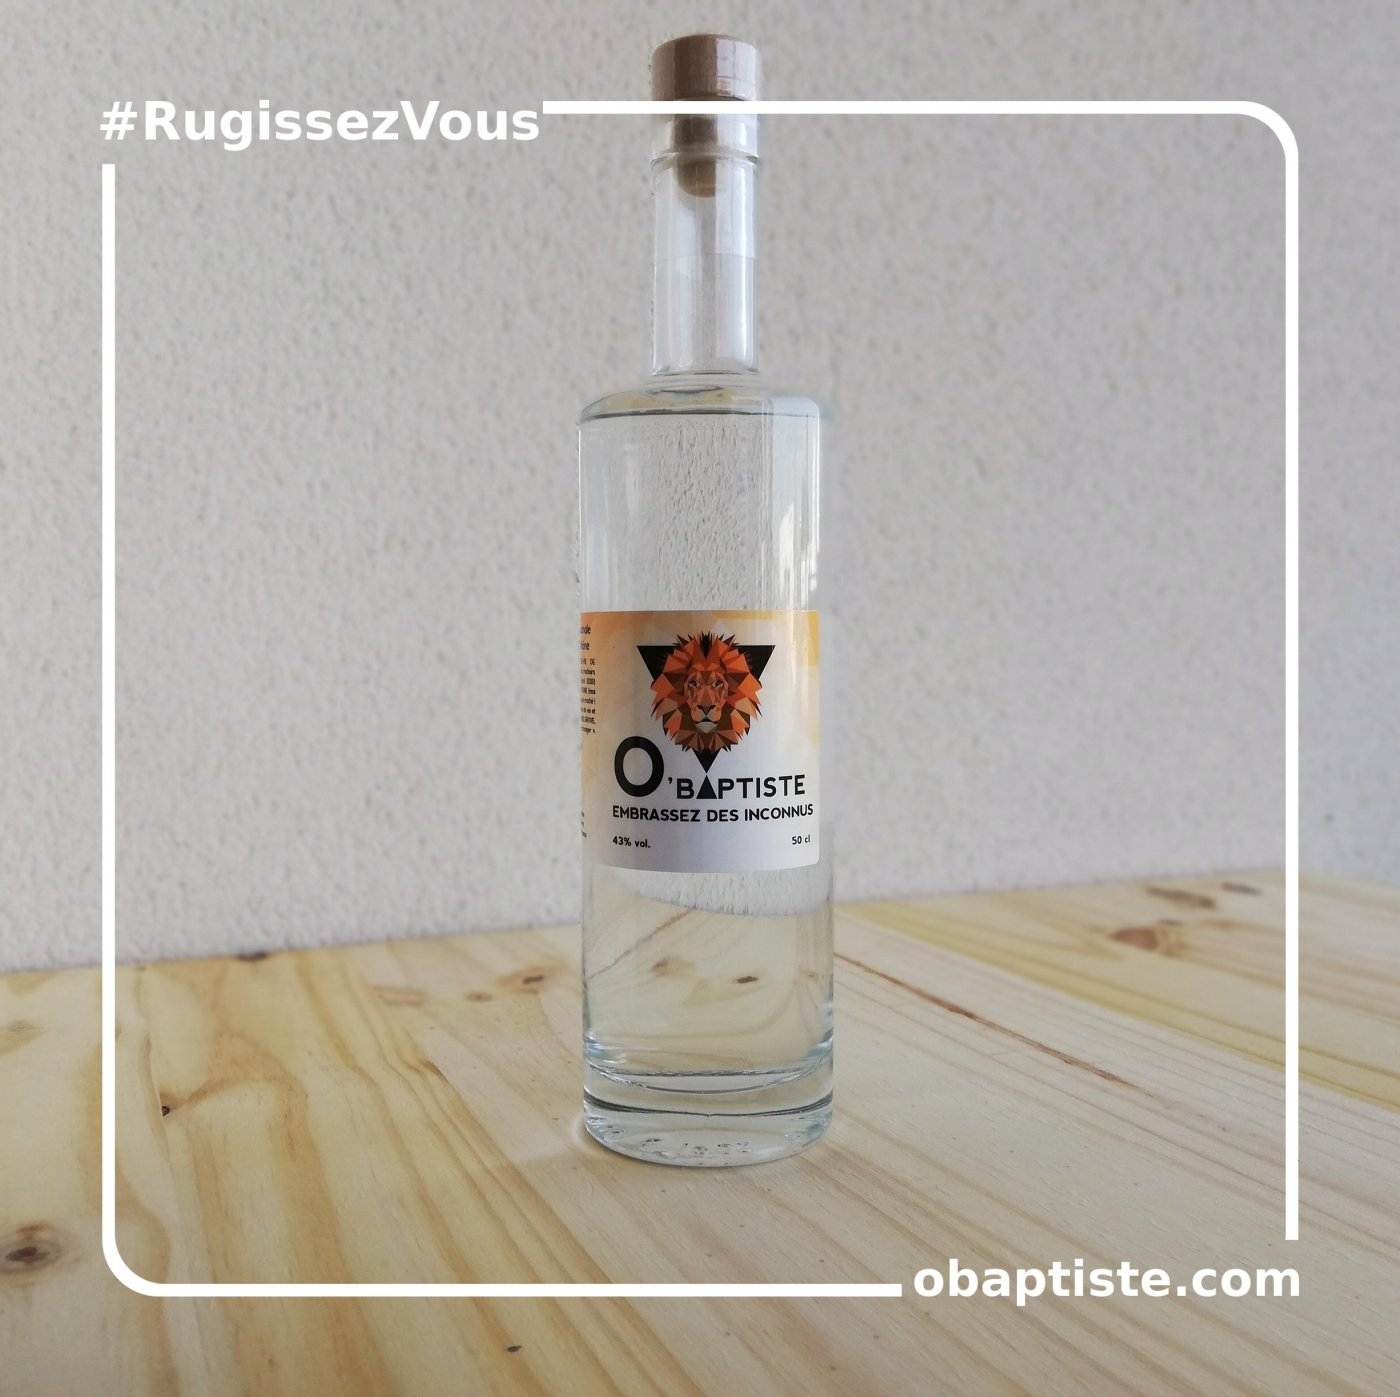 spiritourisme-oenotourisme-distillerie-o-baptiste-a-valence